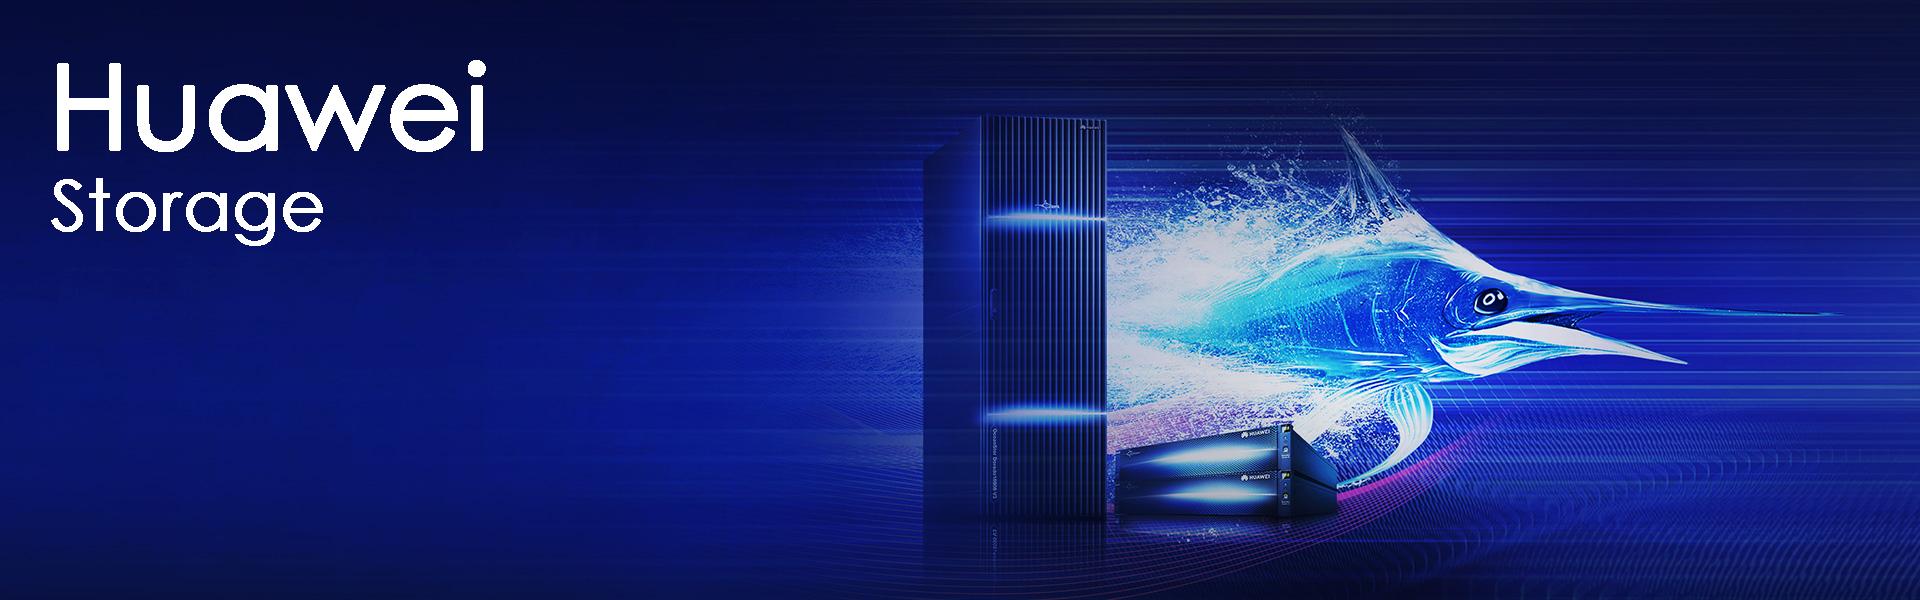 Huawei Storage